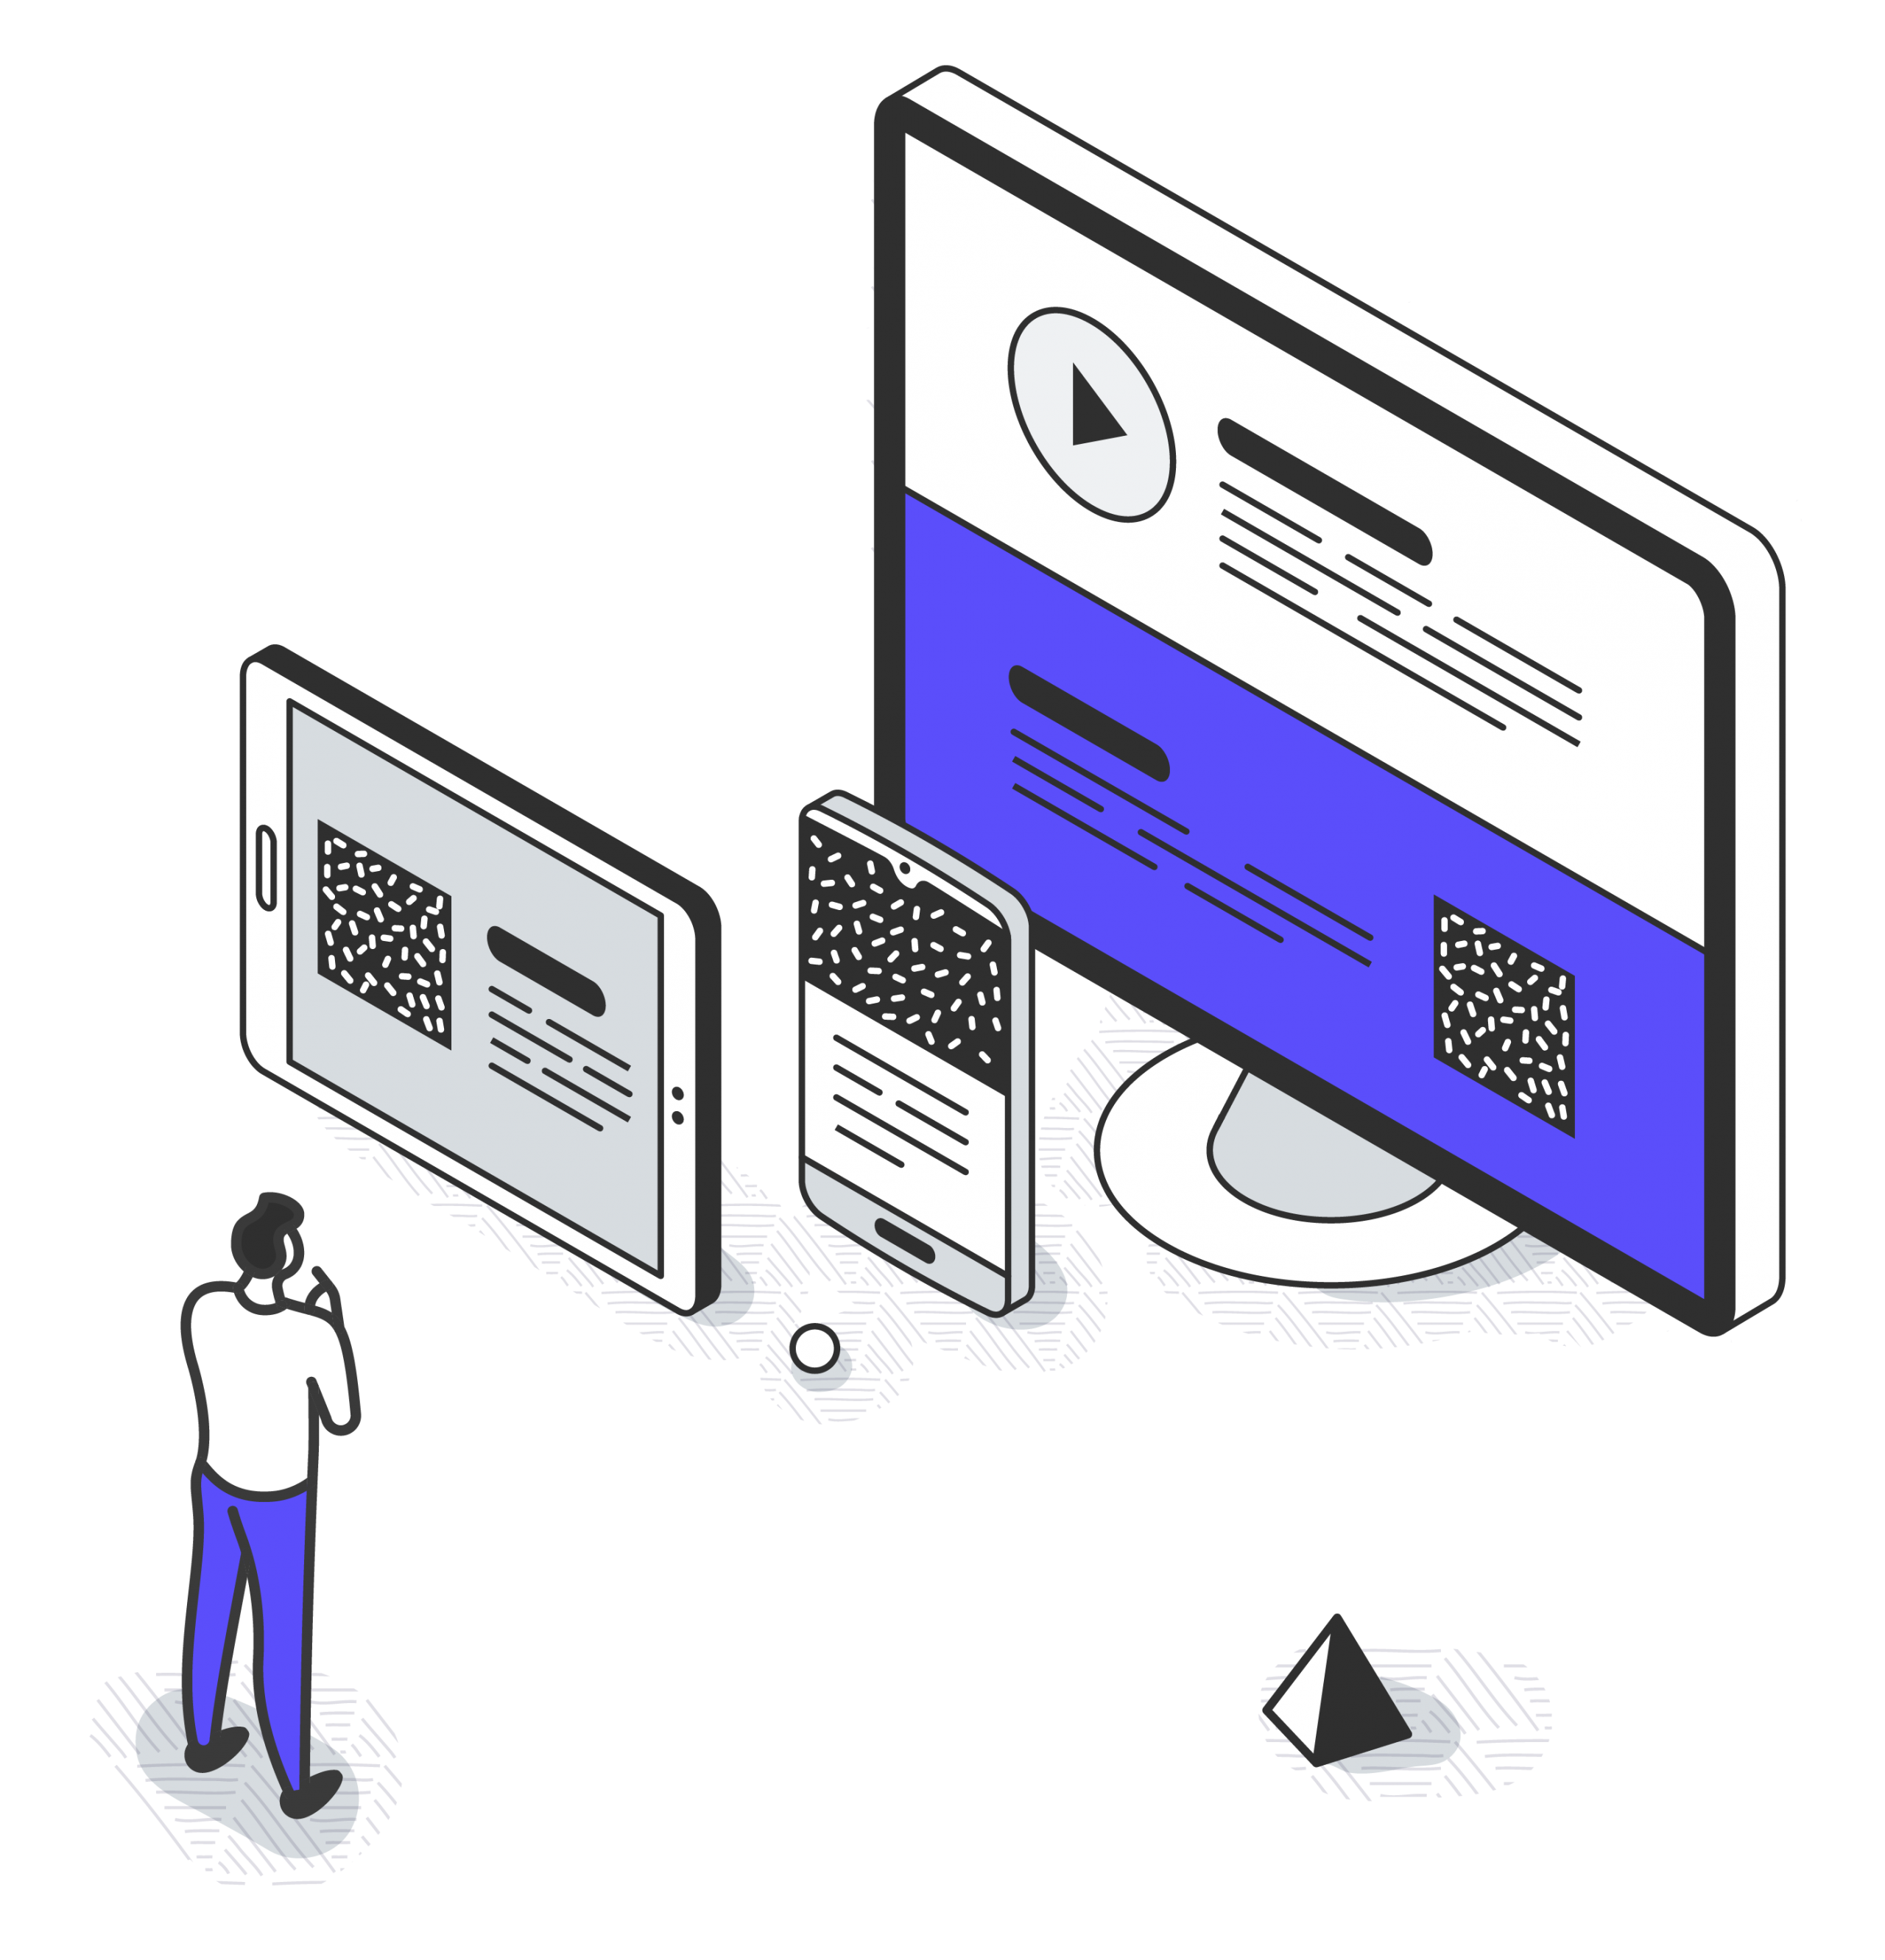 WordPress-powered-websites-digital-markketing-agency-Brisbane-graphic-header2